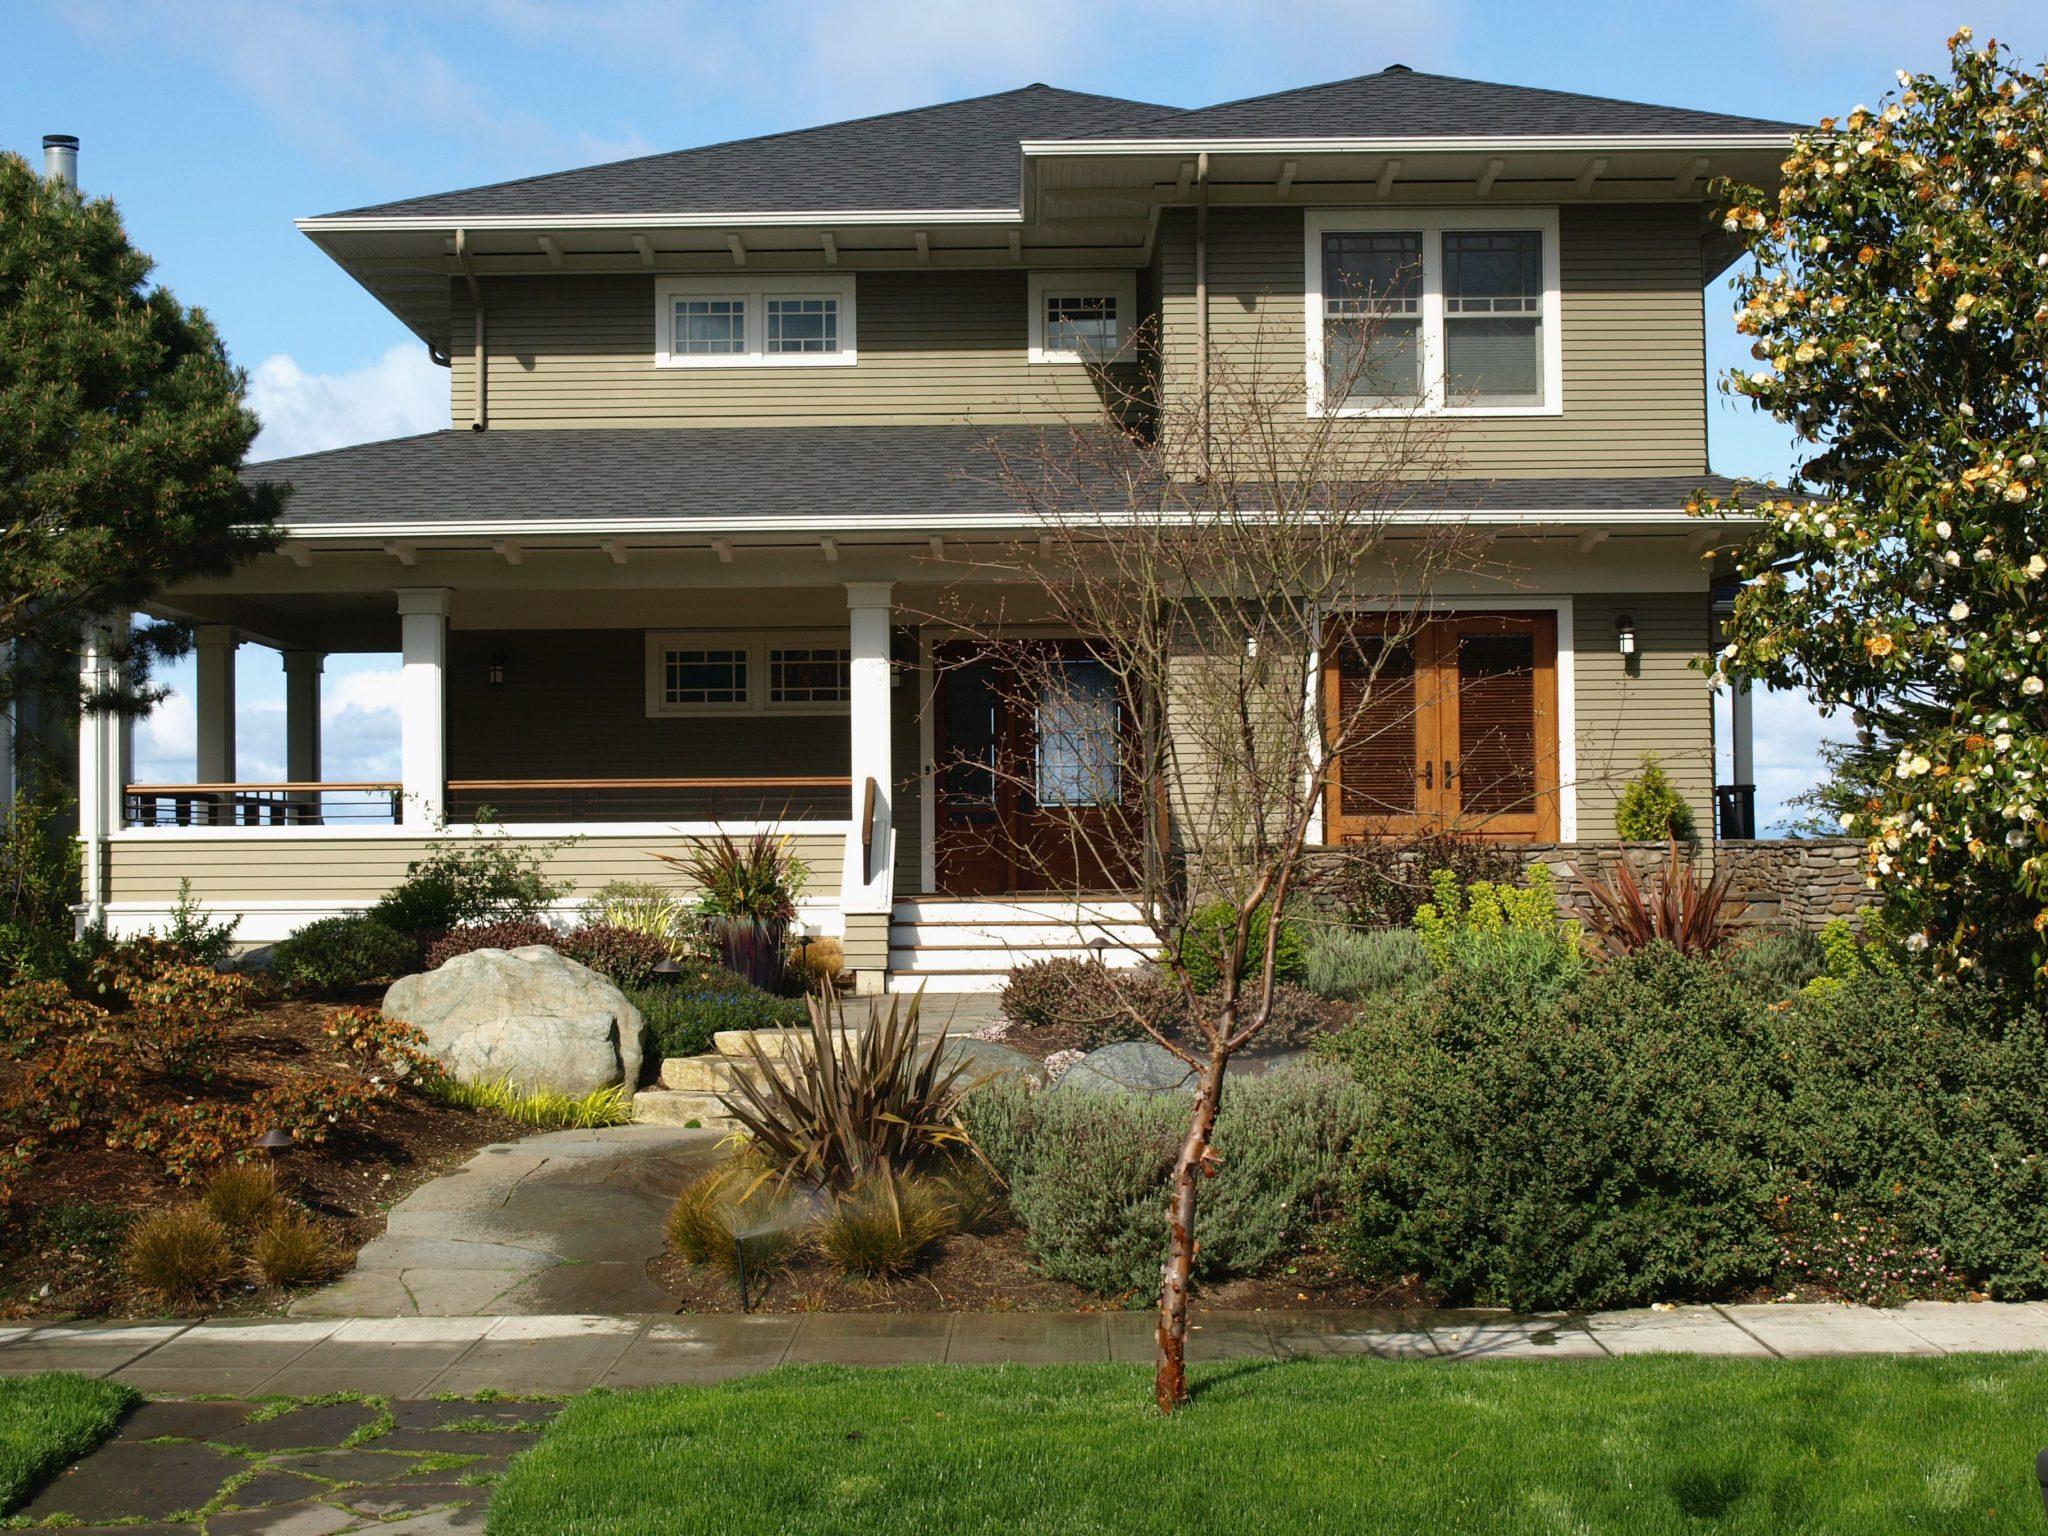 Best Kitchen Gallery: Cta Design Builders Seattle Architect of Seattle Home Design  on rachelxblog.com